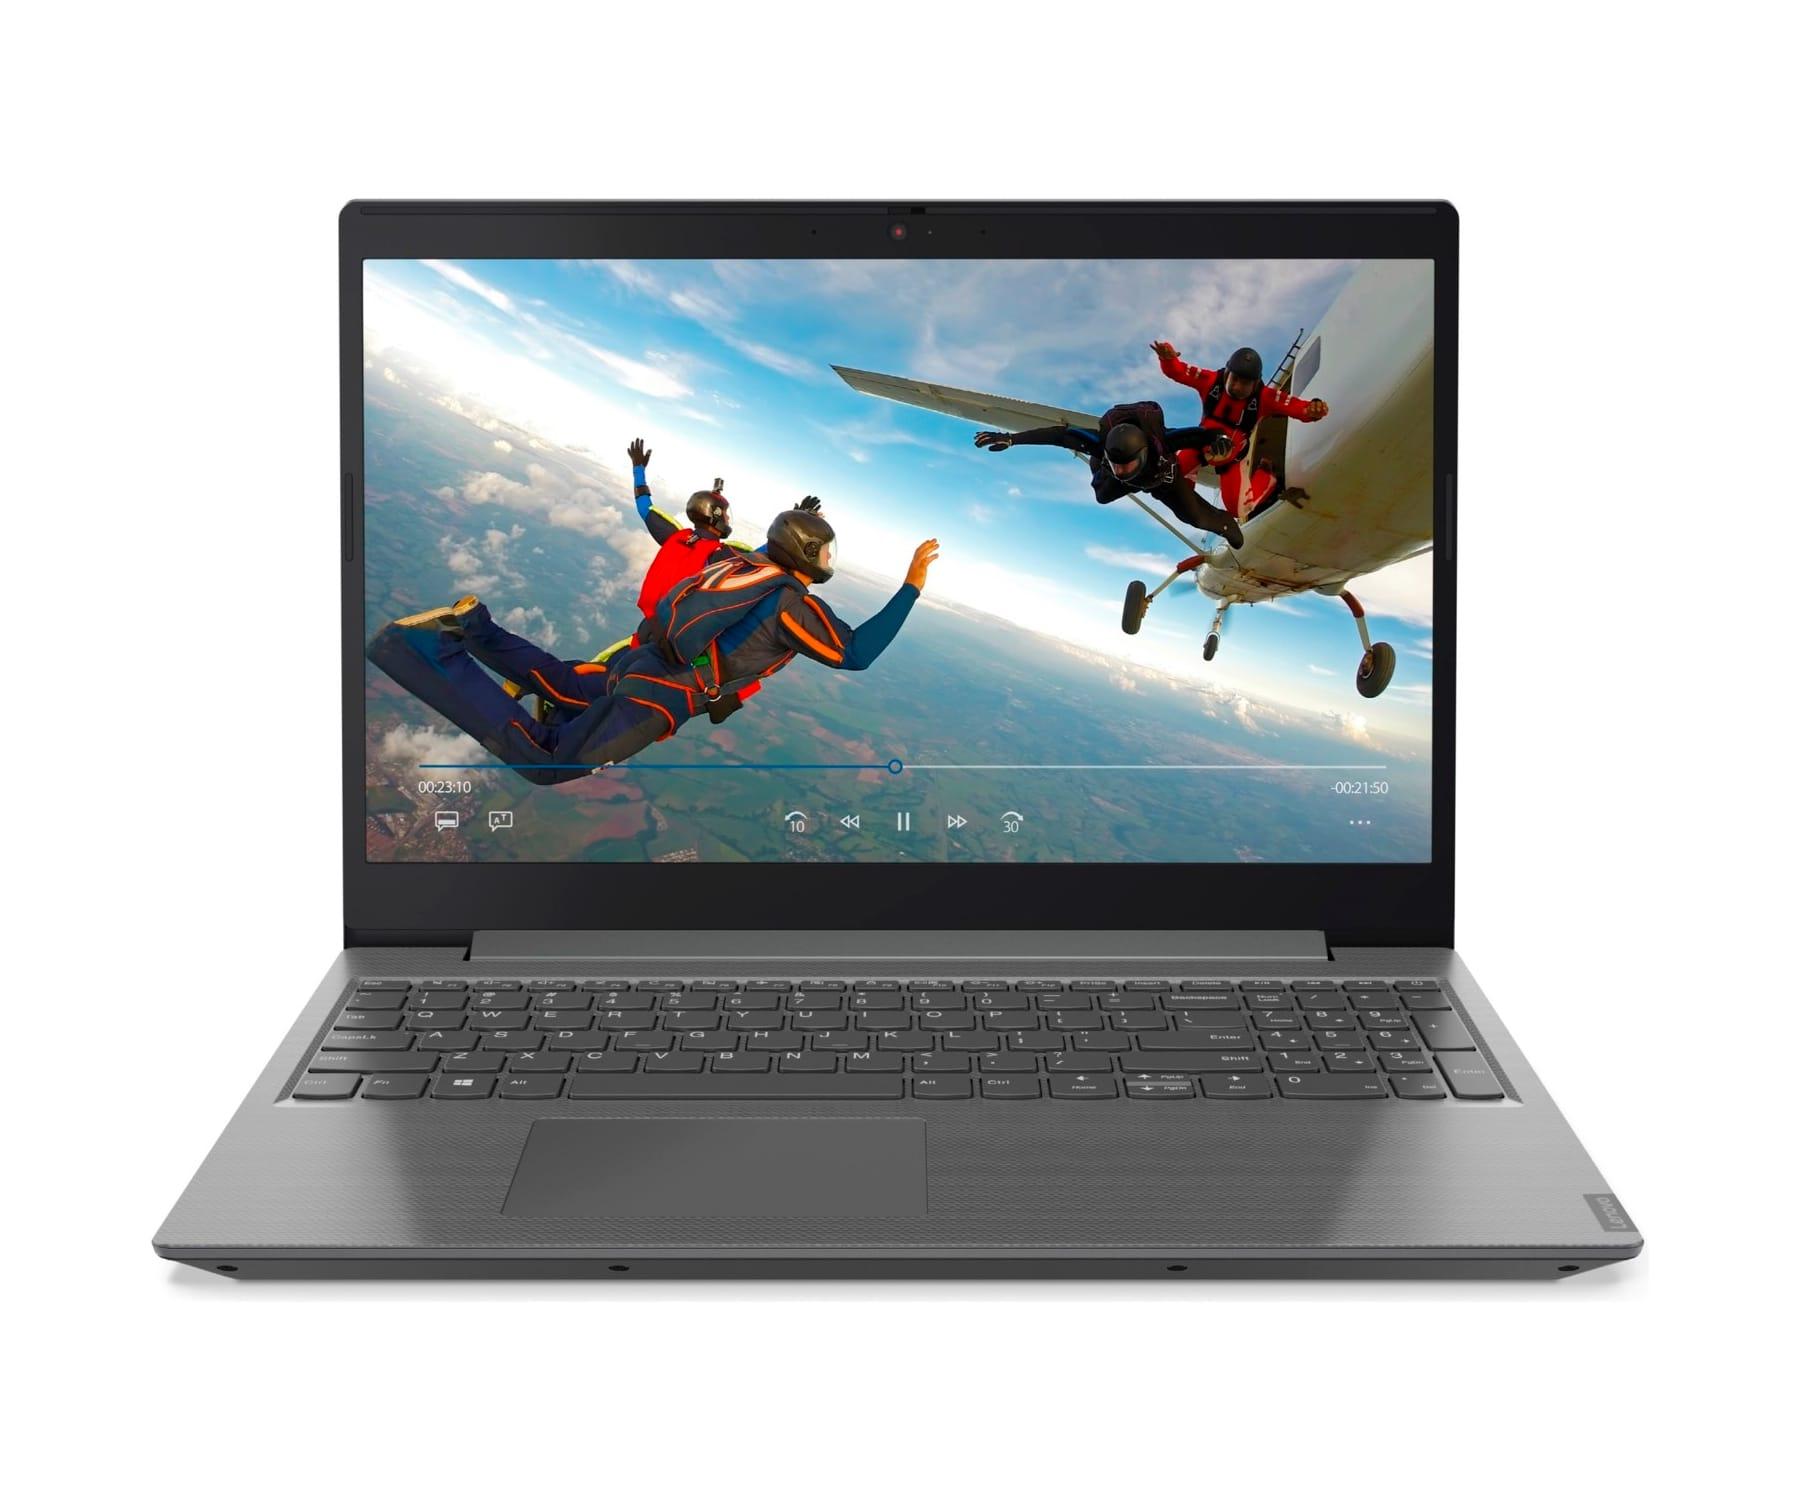 LENOVO V15-IIL GRIS PORTÁTIL 15.6'' LED HD i3-1005G1 256GB SSD 8GB RAM FREEDOS